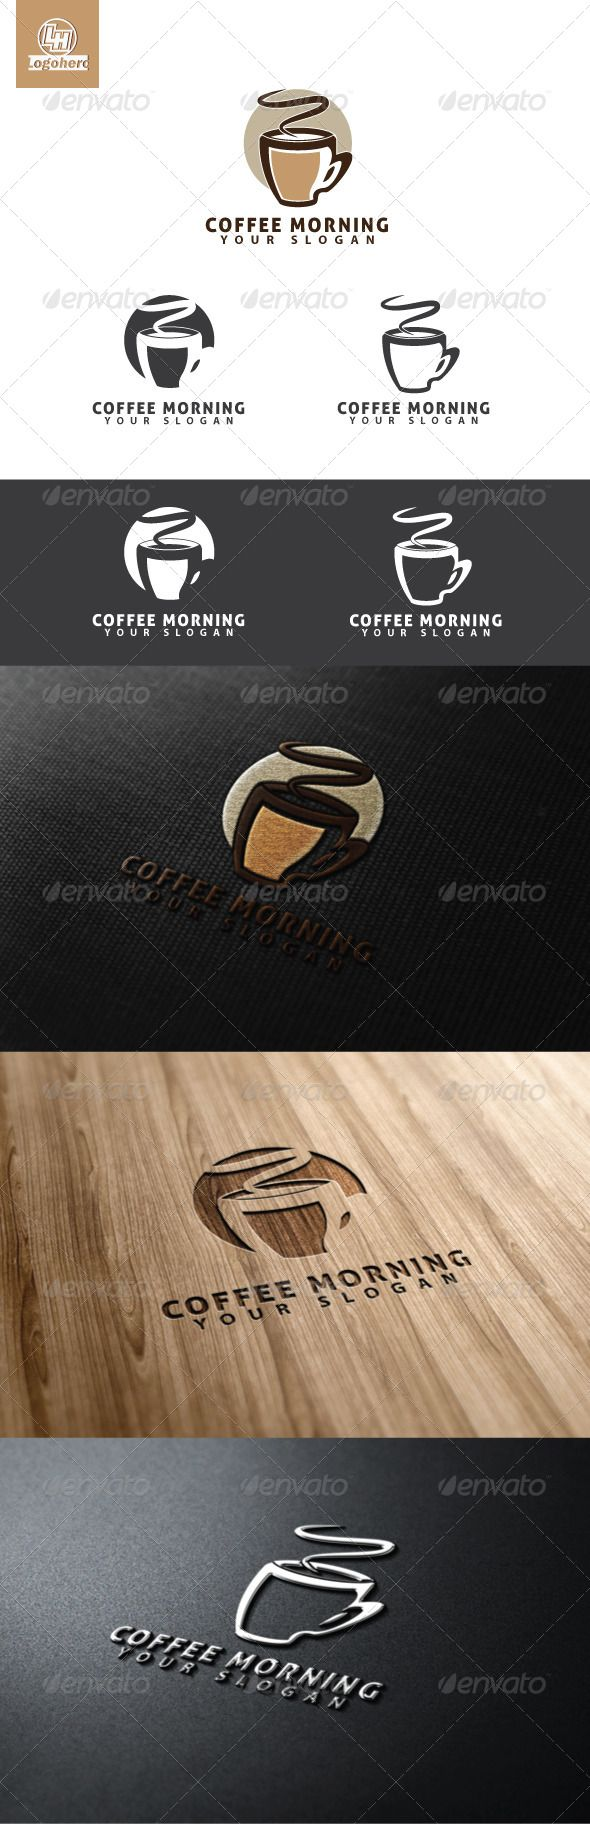 Coffee Morning Logo Template Vector FormatLetter LogoOffice